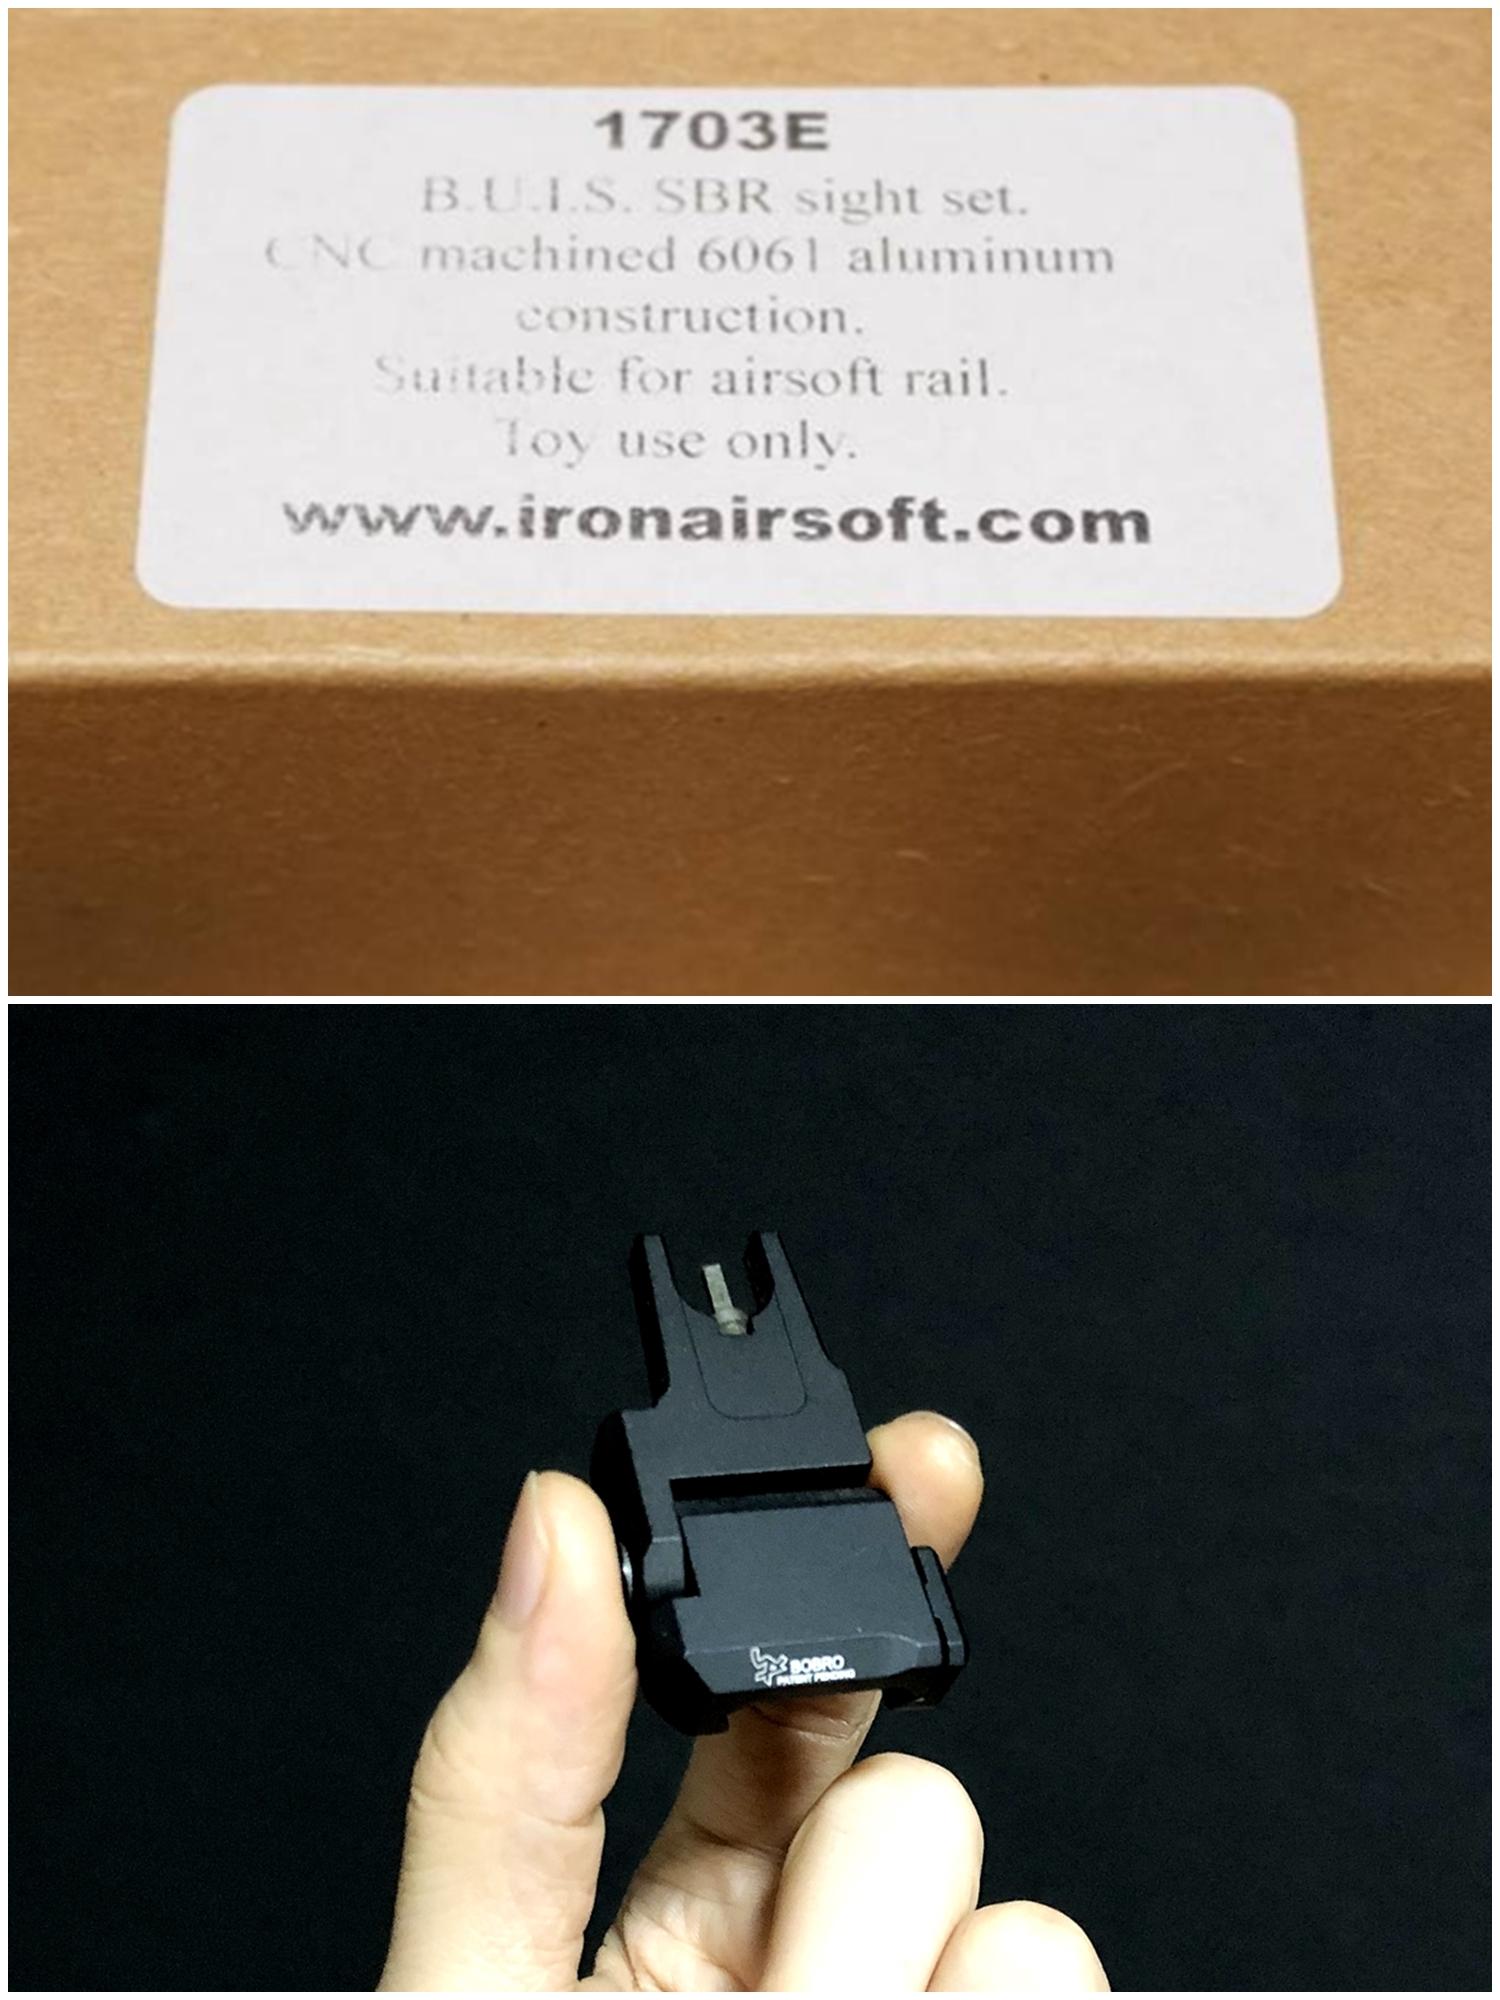 1 IRON AIRSOFT BOBRO BUIS SBR Low Rider 極薄 フォールディングサイト!! CQB戦 or 夜戦 NOVESKE NSR 7 M-LOK 仕様 ハンドガード & アッパーフレームを 追加で作っちゃお!! 購入 組込 分解 取付 レビュー!! したる